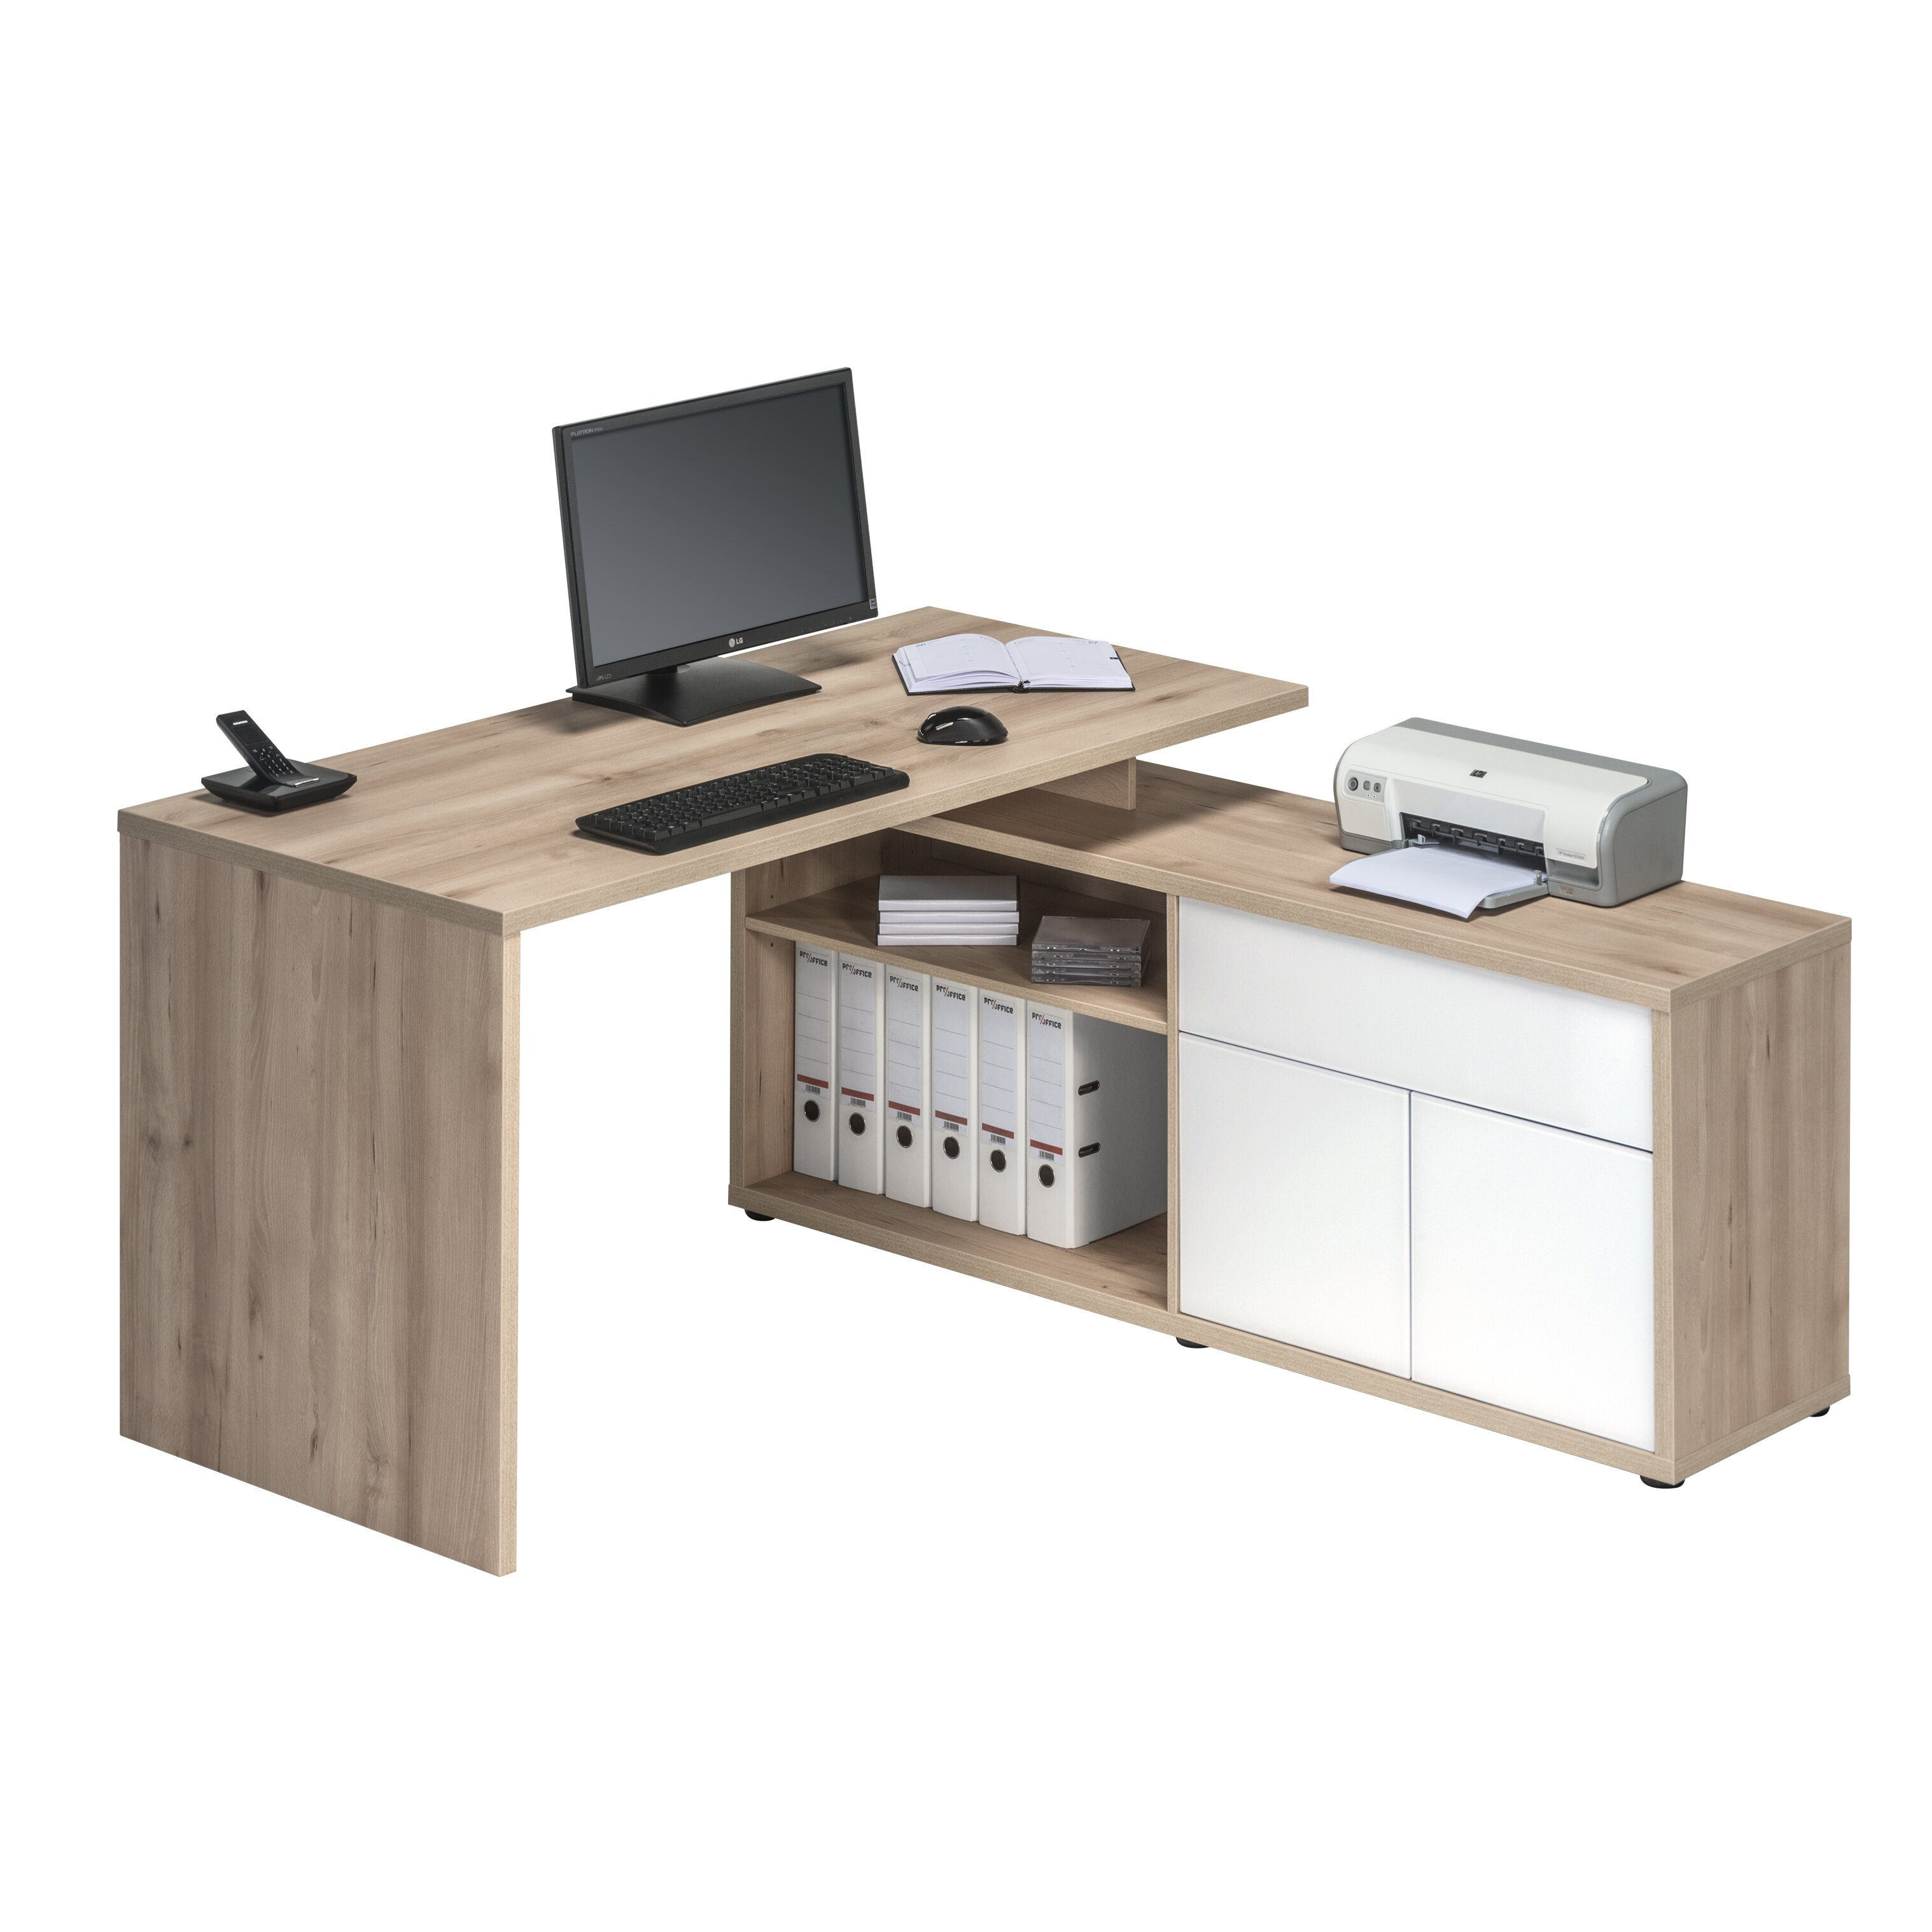 maja m bel schreibtisch reviews von maja m bel. Black Bedroom Furniture Sets. Home Design Ideas